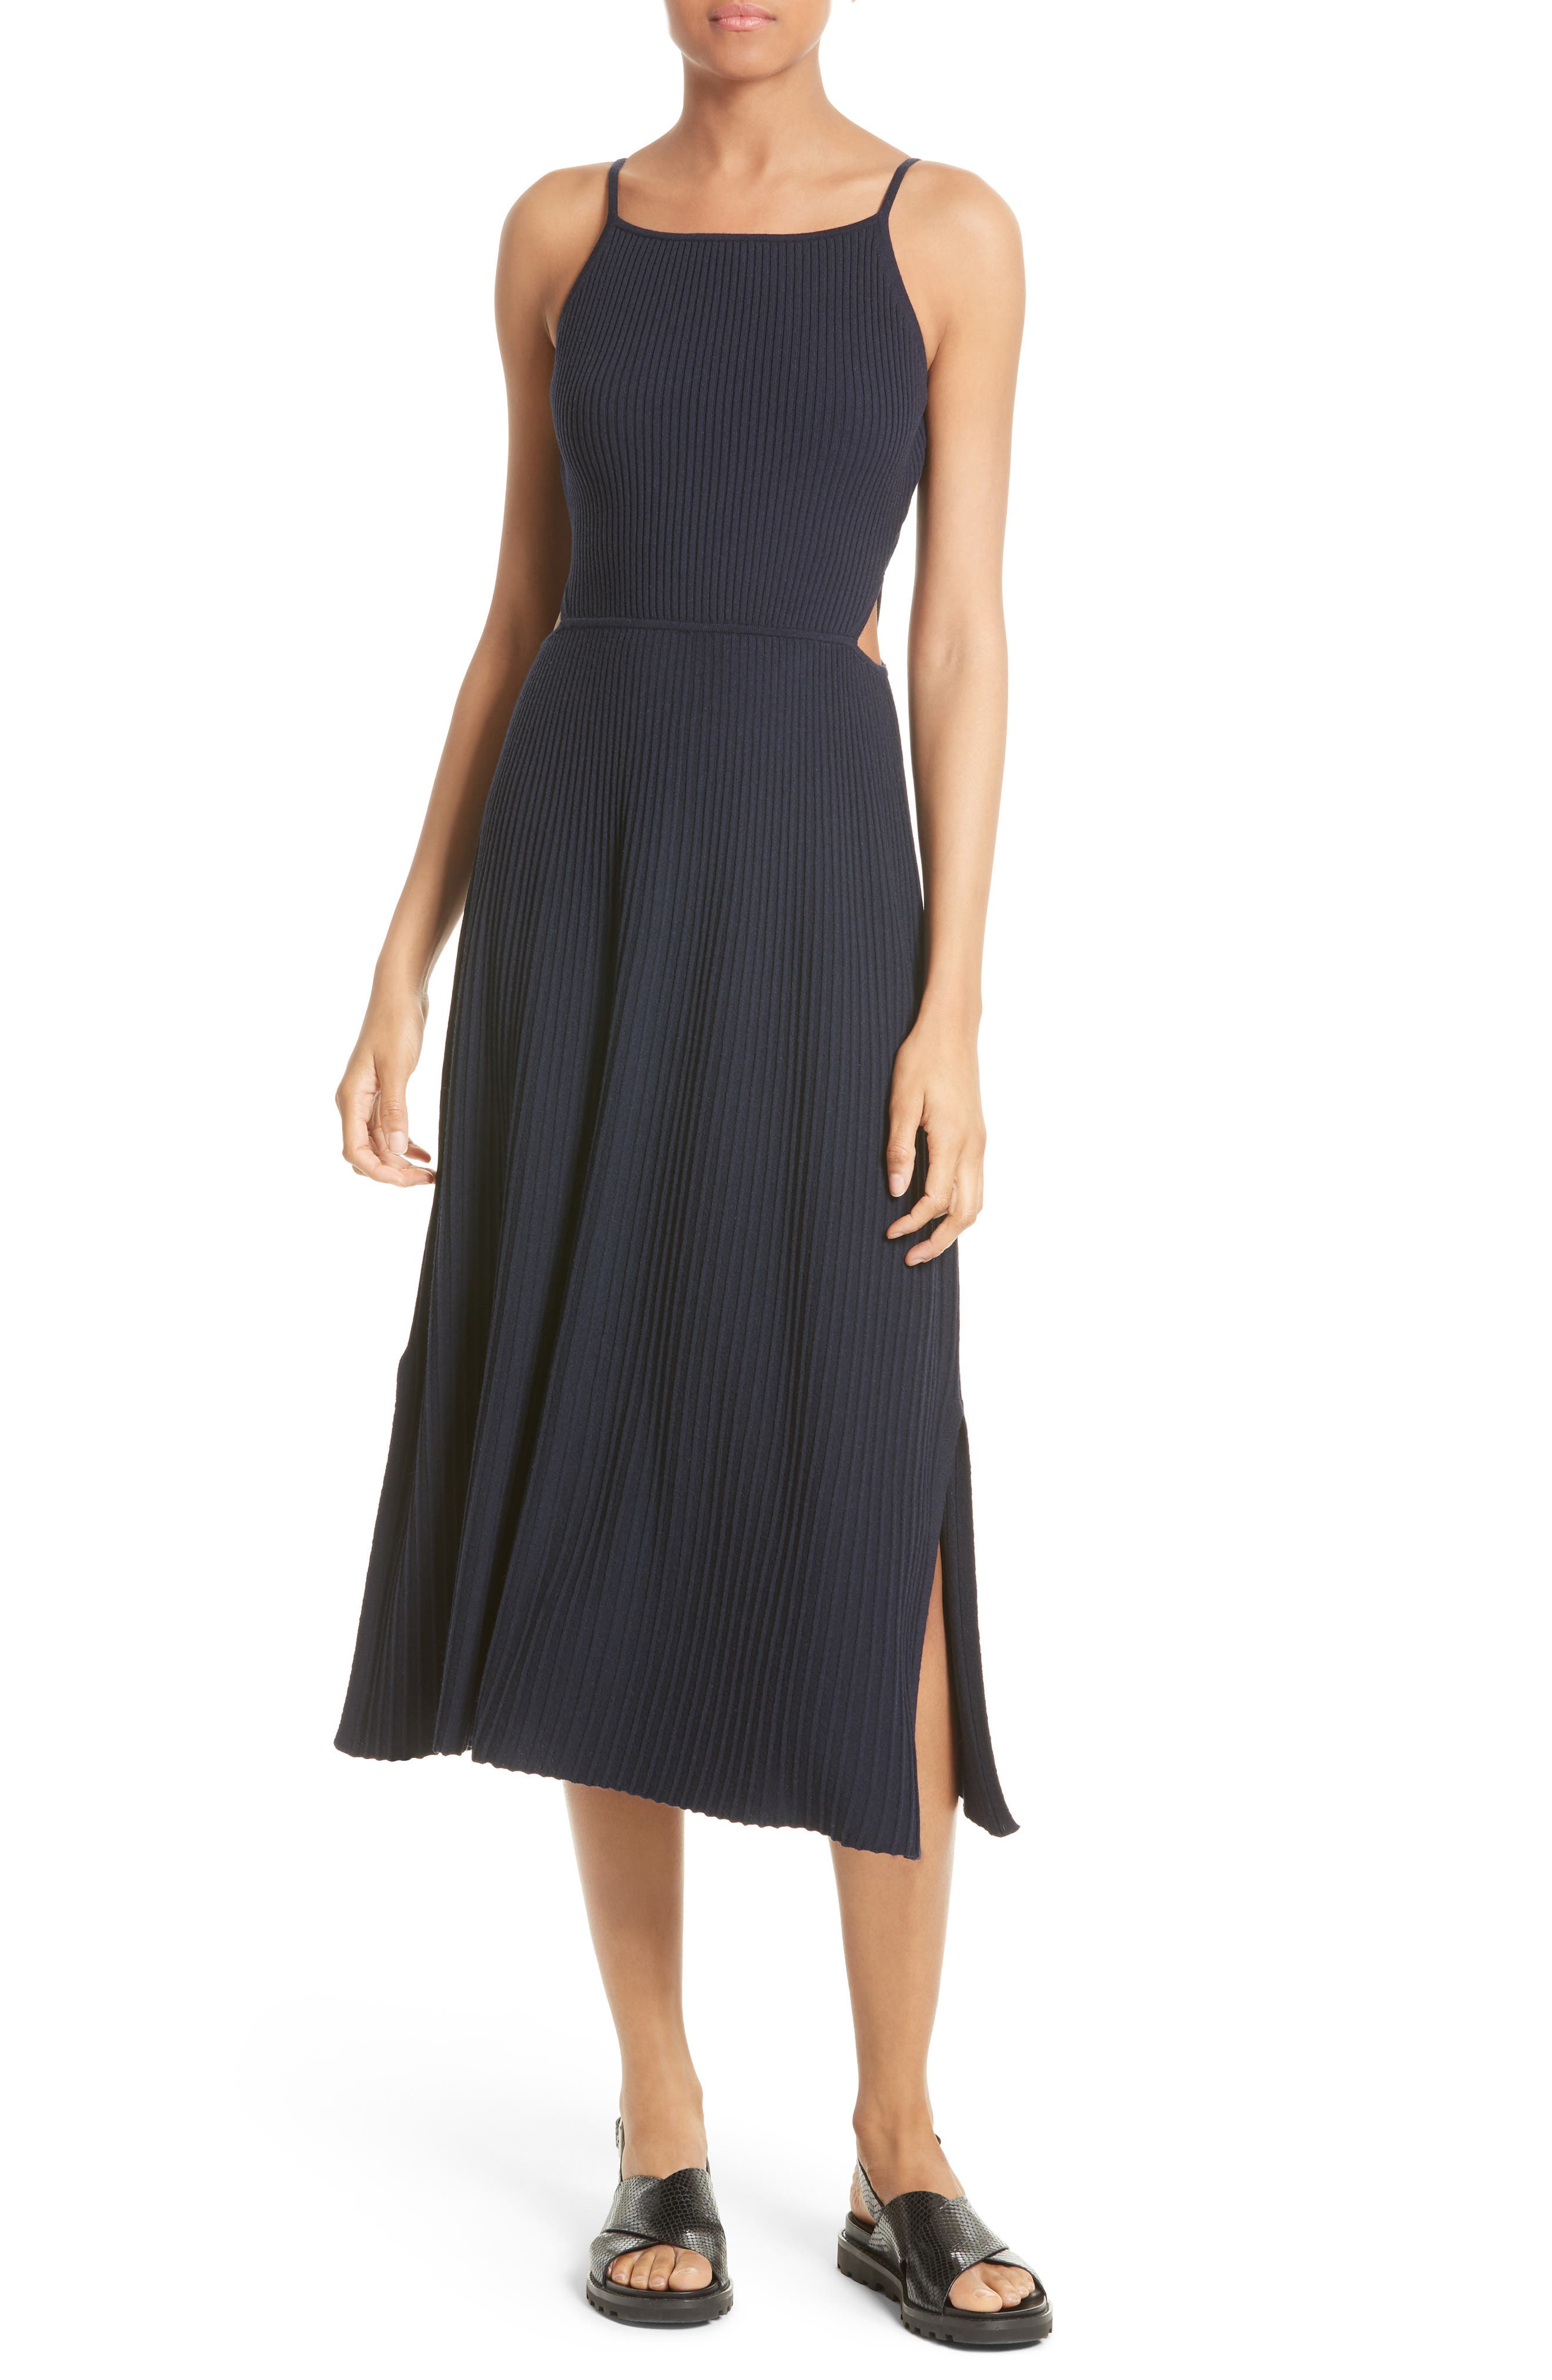 Elizabeth and James Josette Merino Wool Blend Apron Dress